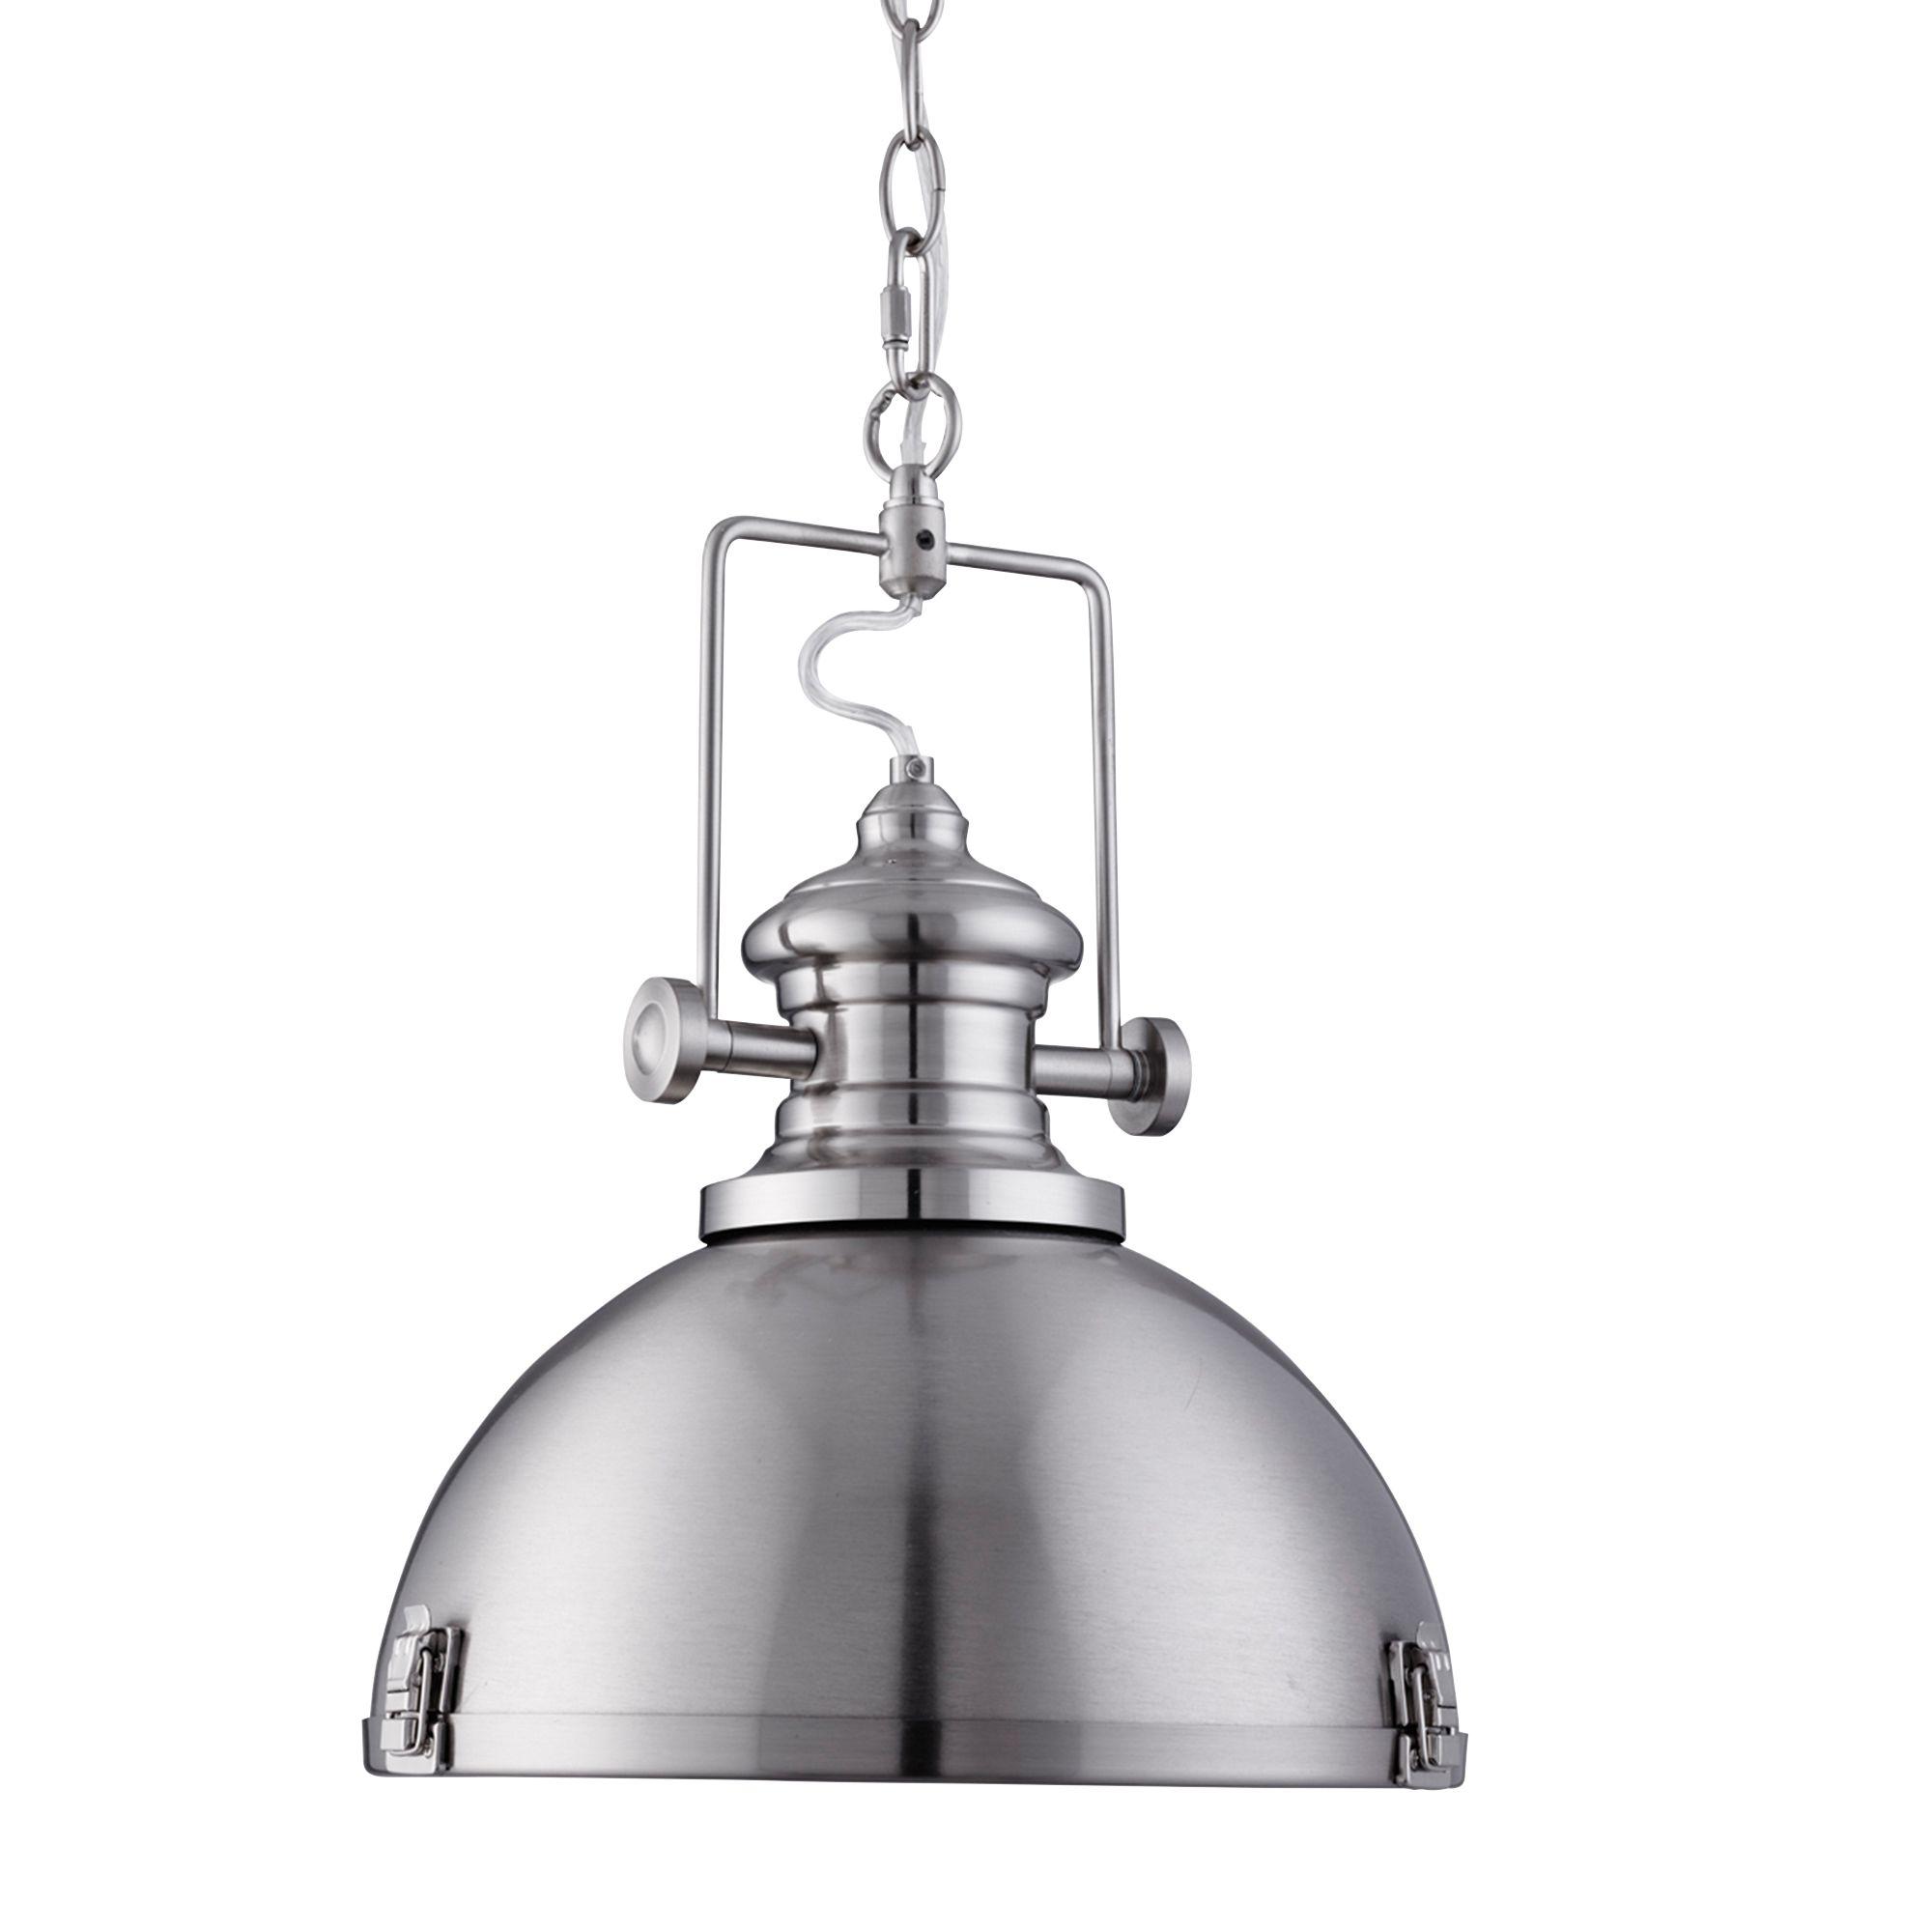 Louisiana Metal Industrial Satin Silver Pendant Light With Acrylic Diffuser